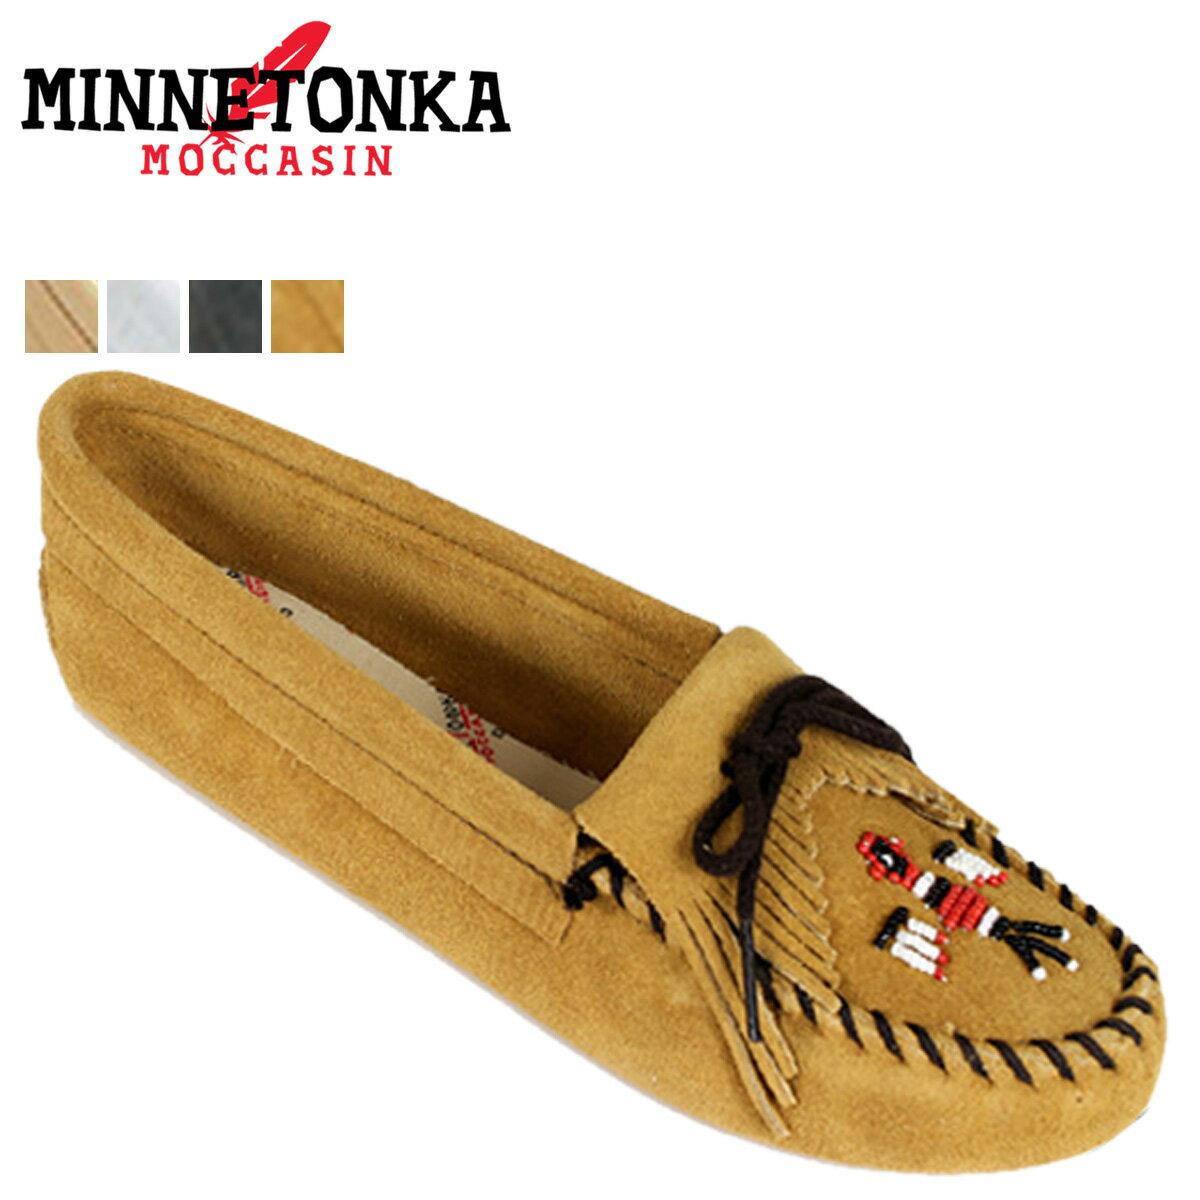 MINNETONKA THUNDERBIRD SOFT SOLE MOC ミネトンカ ルームシューズ モカシン サンダーバード ソフトソール レディース